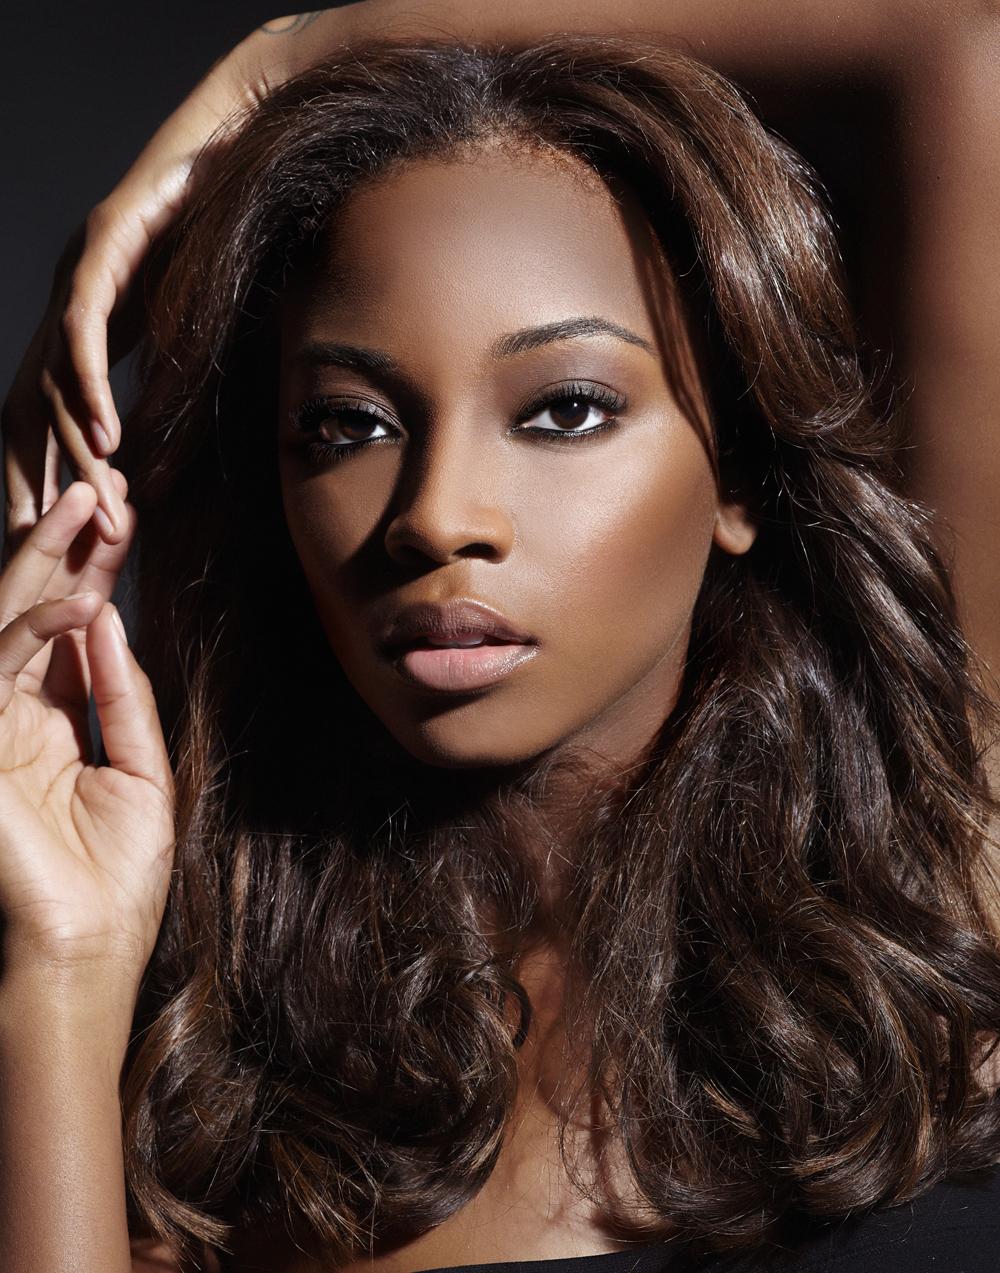 Black Female S Fashion